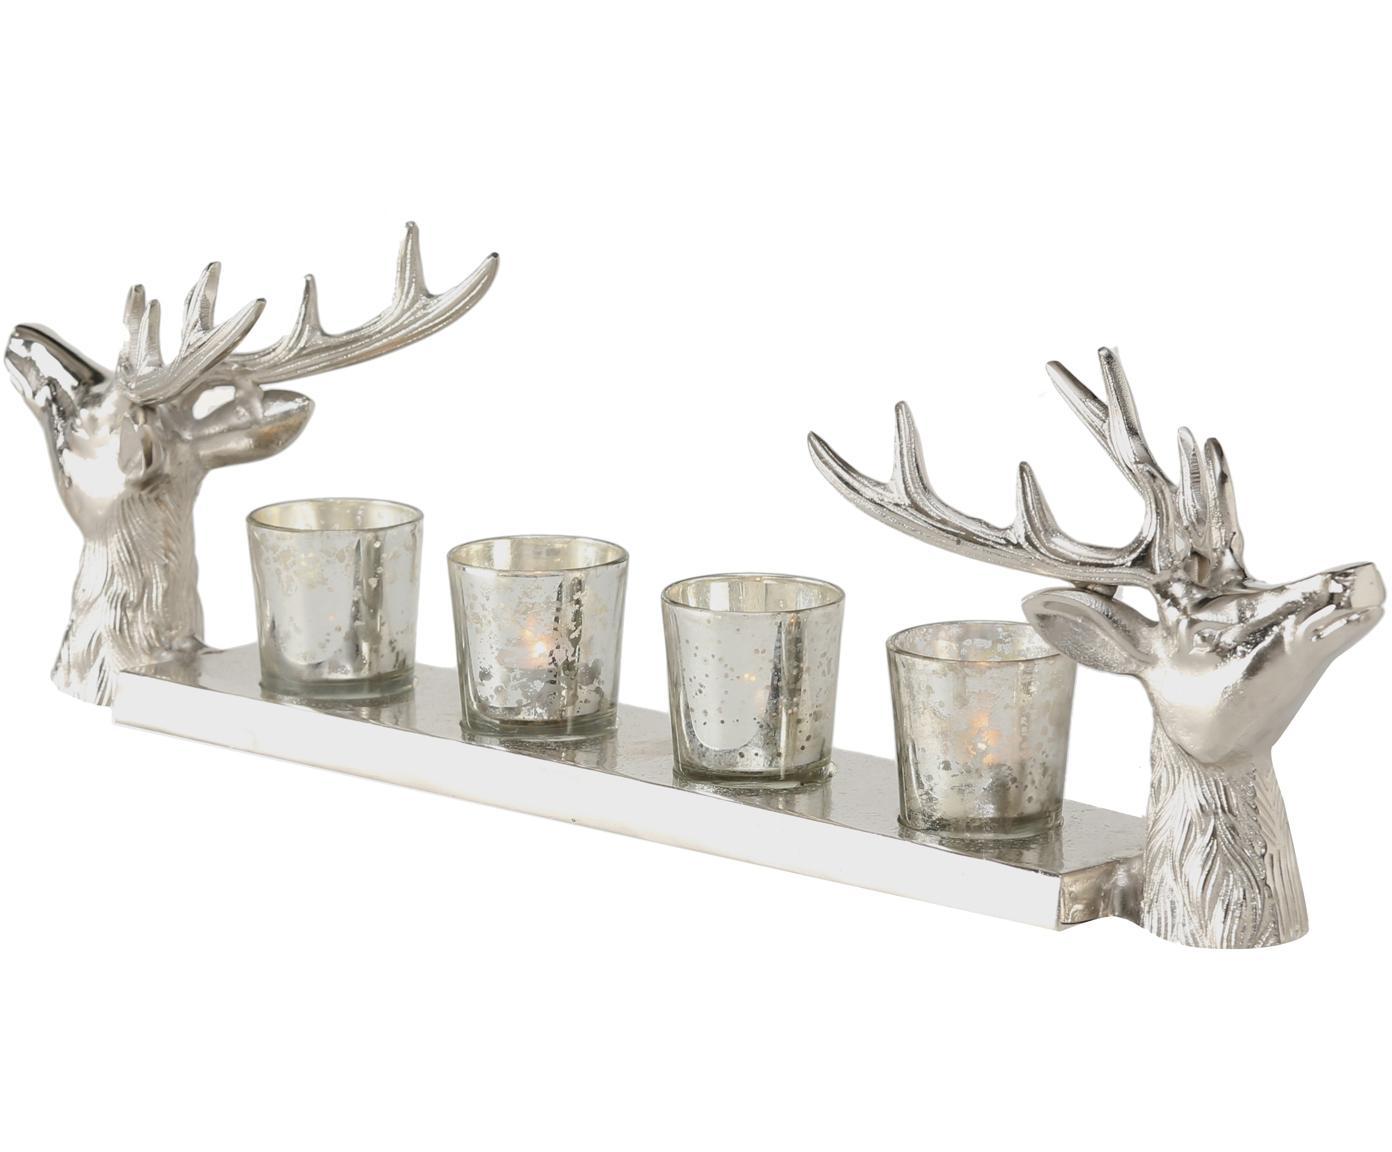 Set de portavelas Hirsch, 5pzas., Bandeja: aluminio, Portavelas: vidrio, Plateado, An 56 x Al 16 cm